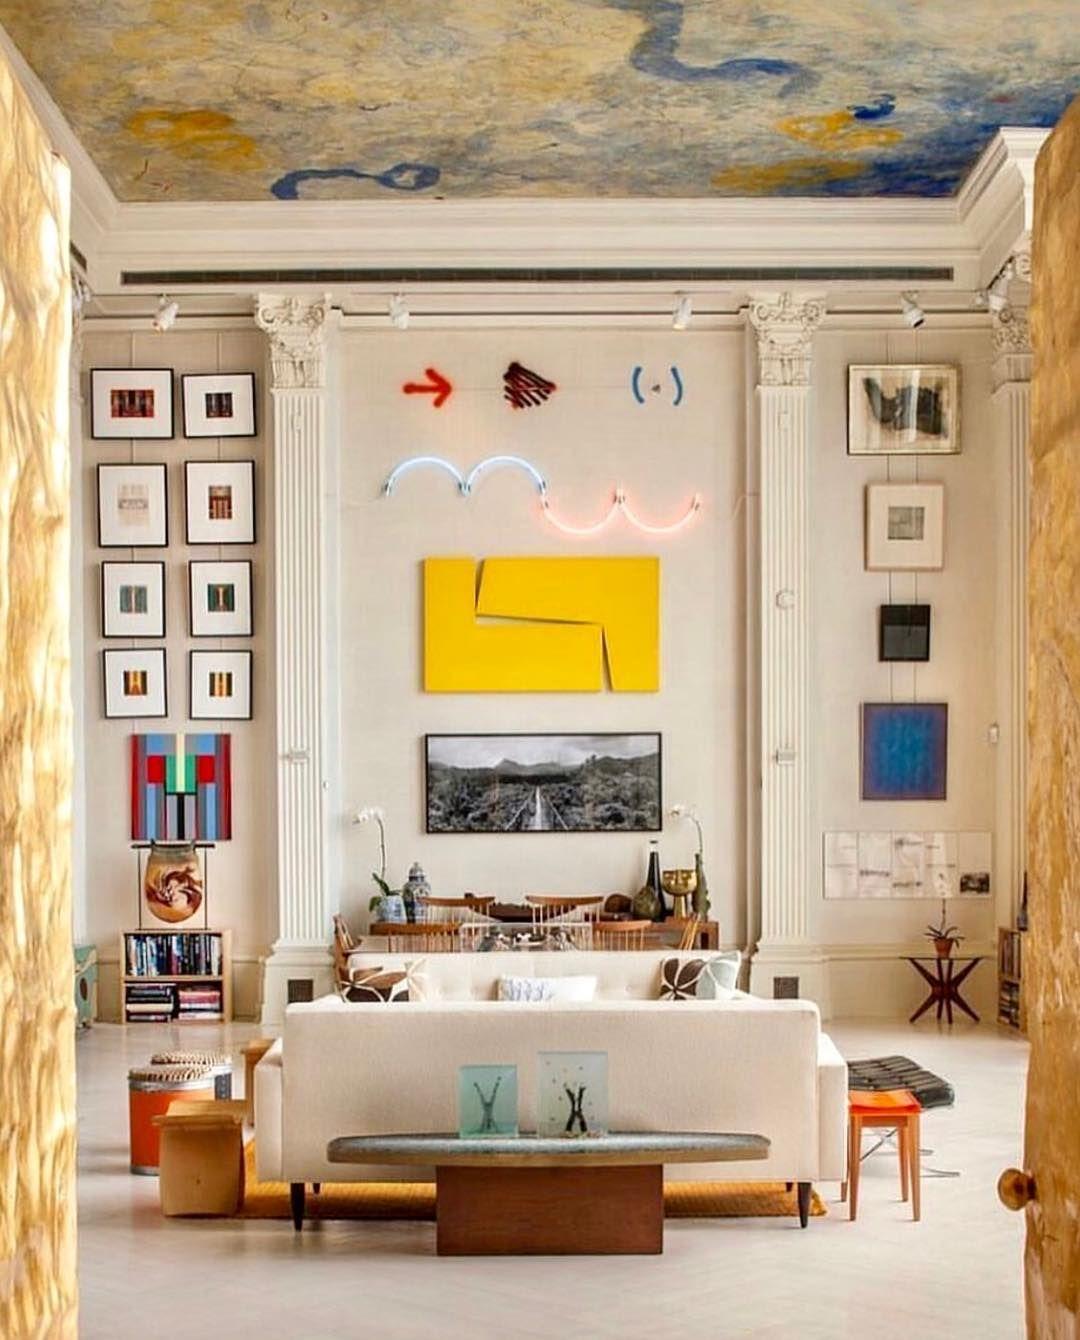 Decor interior design interior decorating painted furniture modern furniture kelly behun